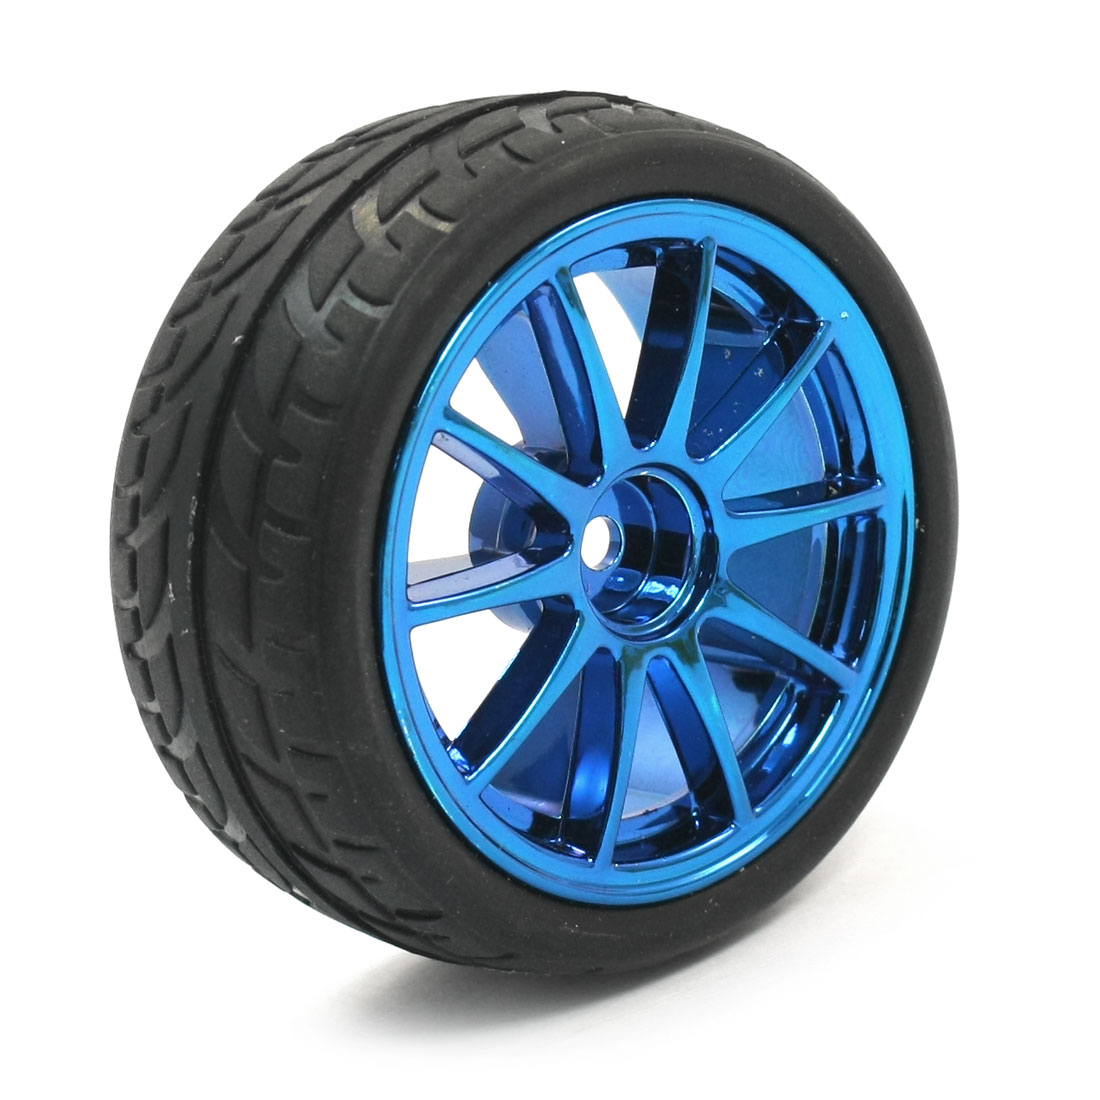 RC Smart Cars Robot On Road DIY Parts 65mm 1:10 Tire Wheel Rim Blue